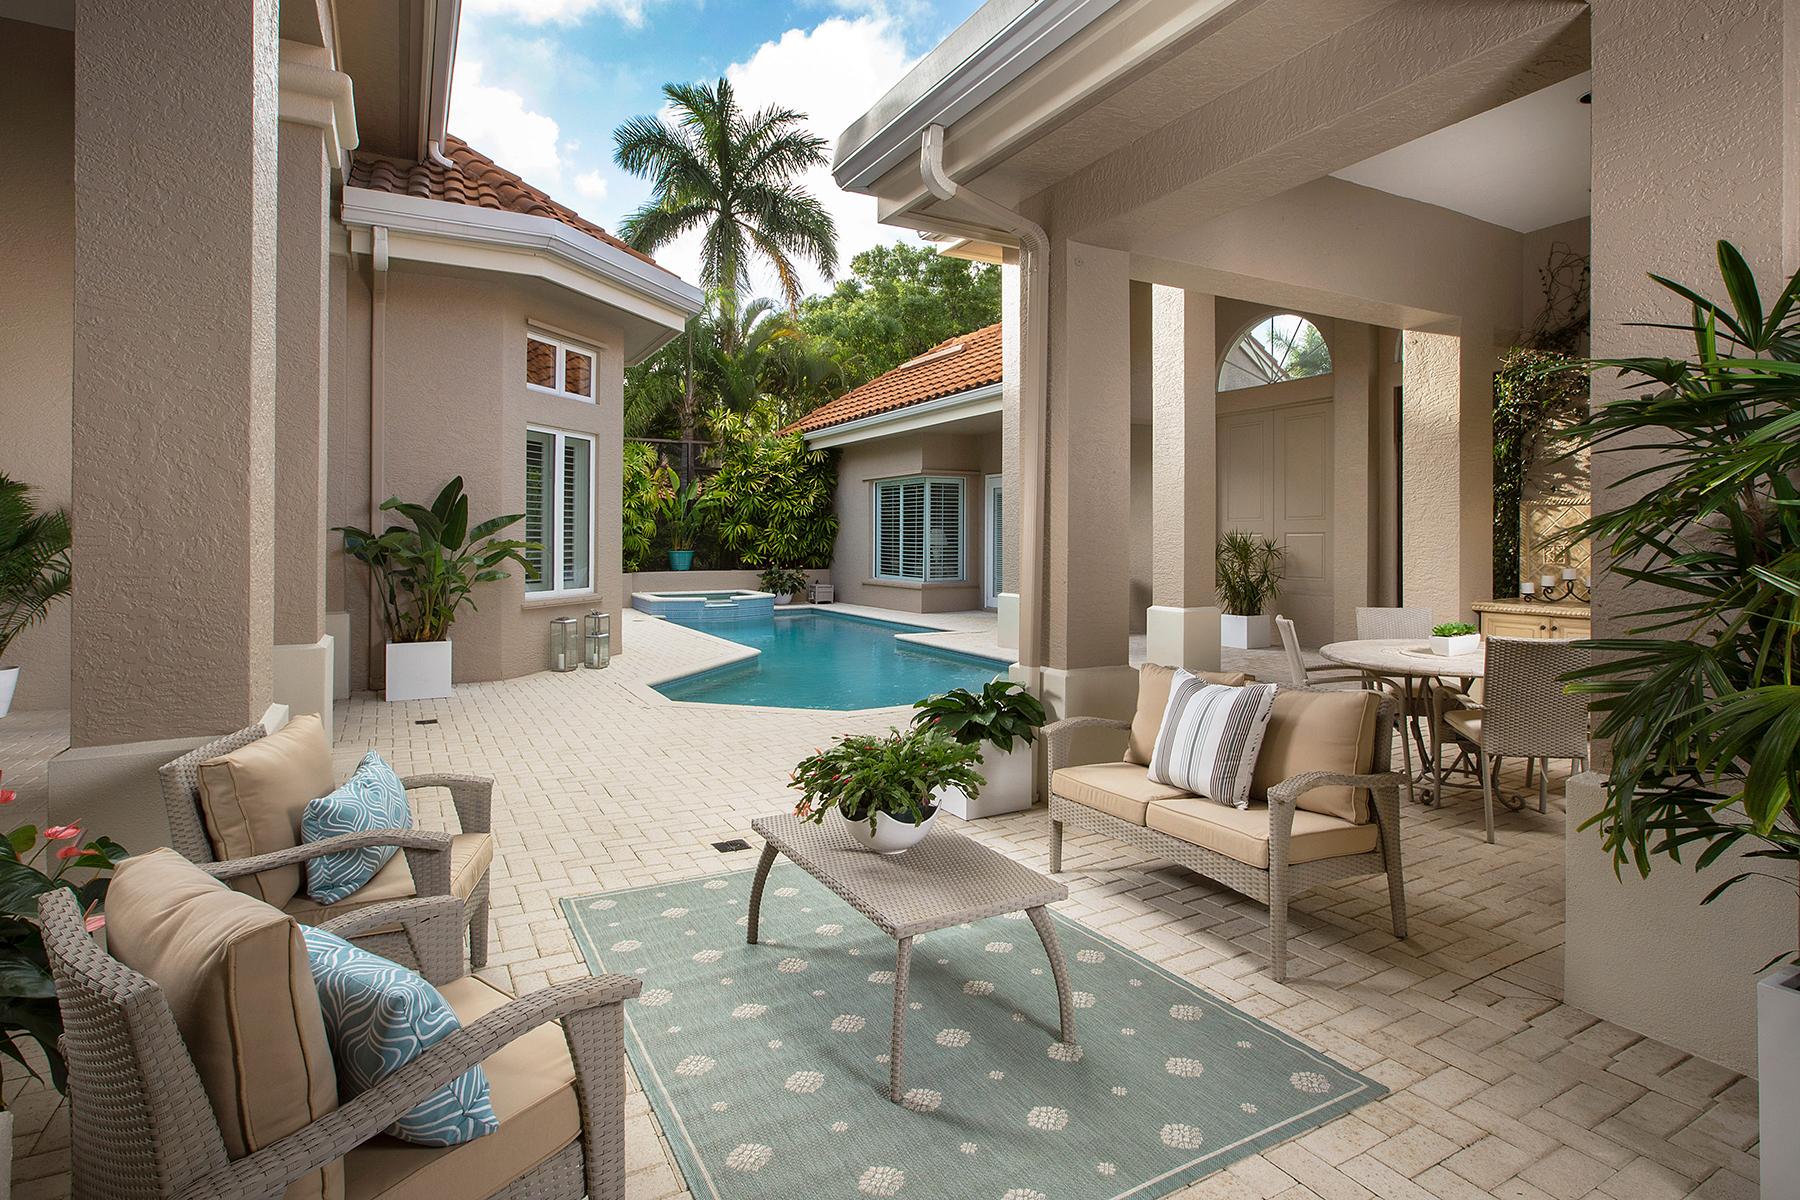 Casa Unifamiliar por un Venta en Naples 2080 Gordon Dr Naples, Florida, 34102 Estados Unidos